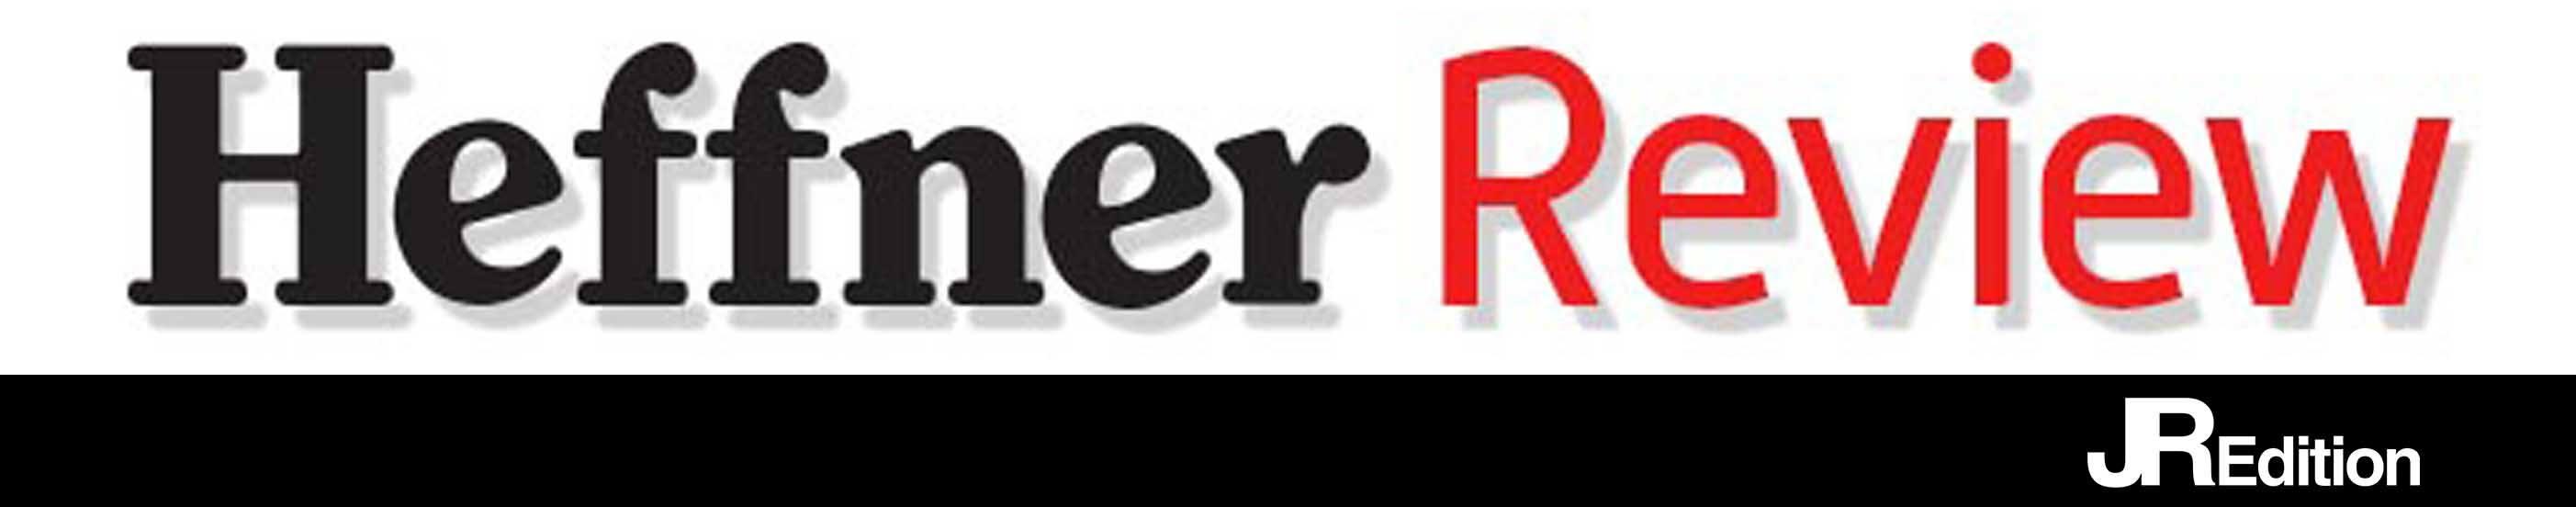 Heffner Review Jr Edition Logo